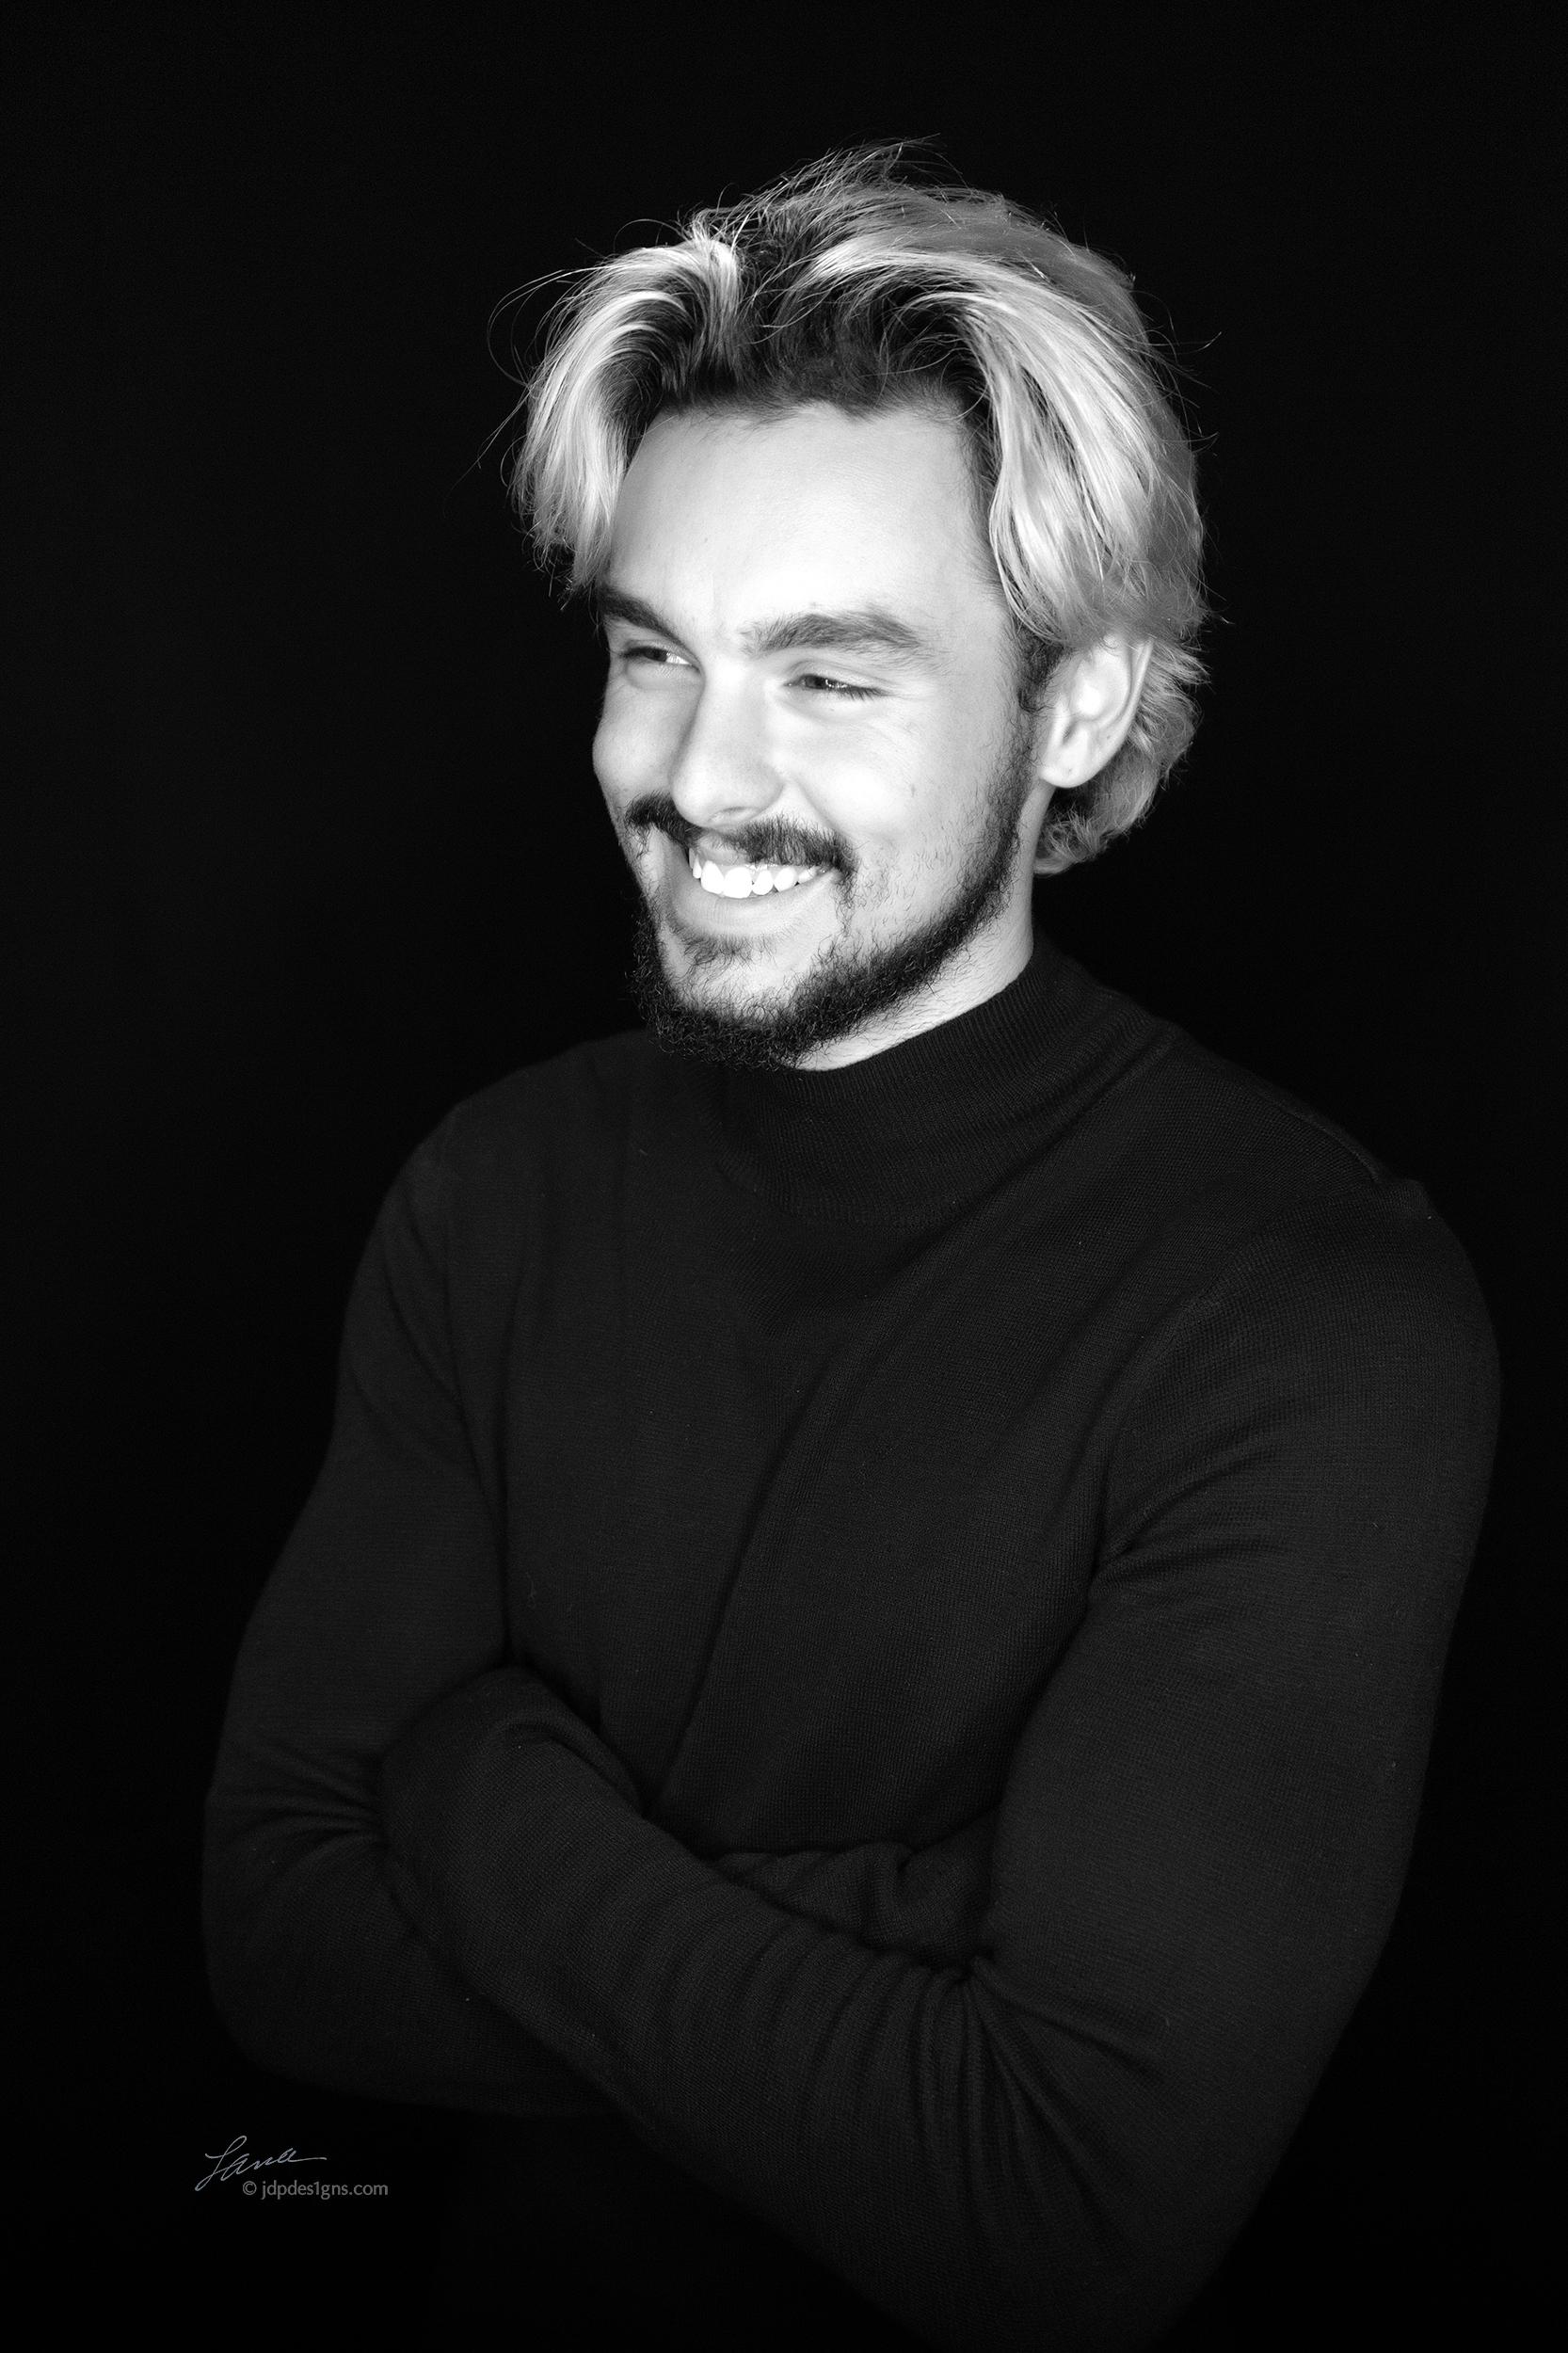 Davis Smile bw.jpg